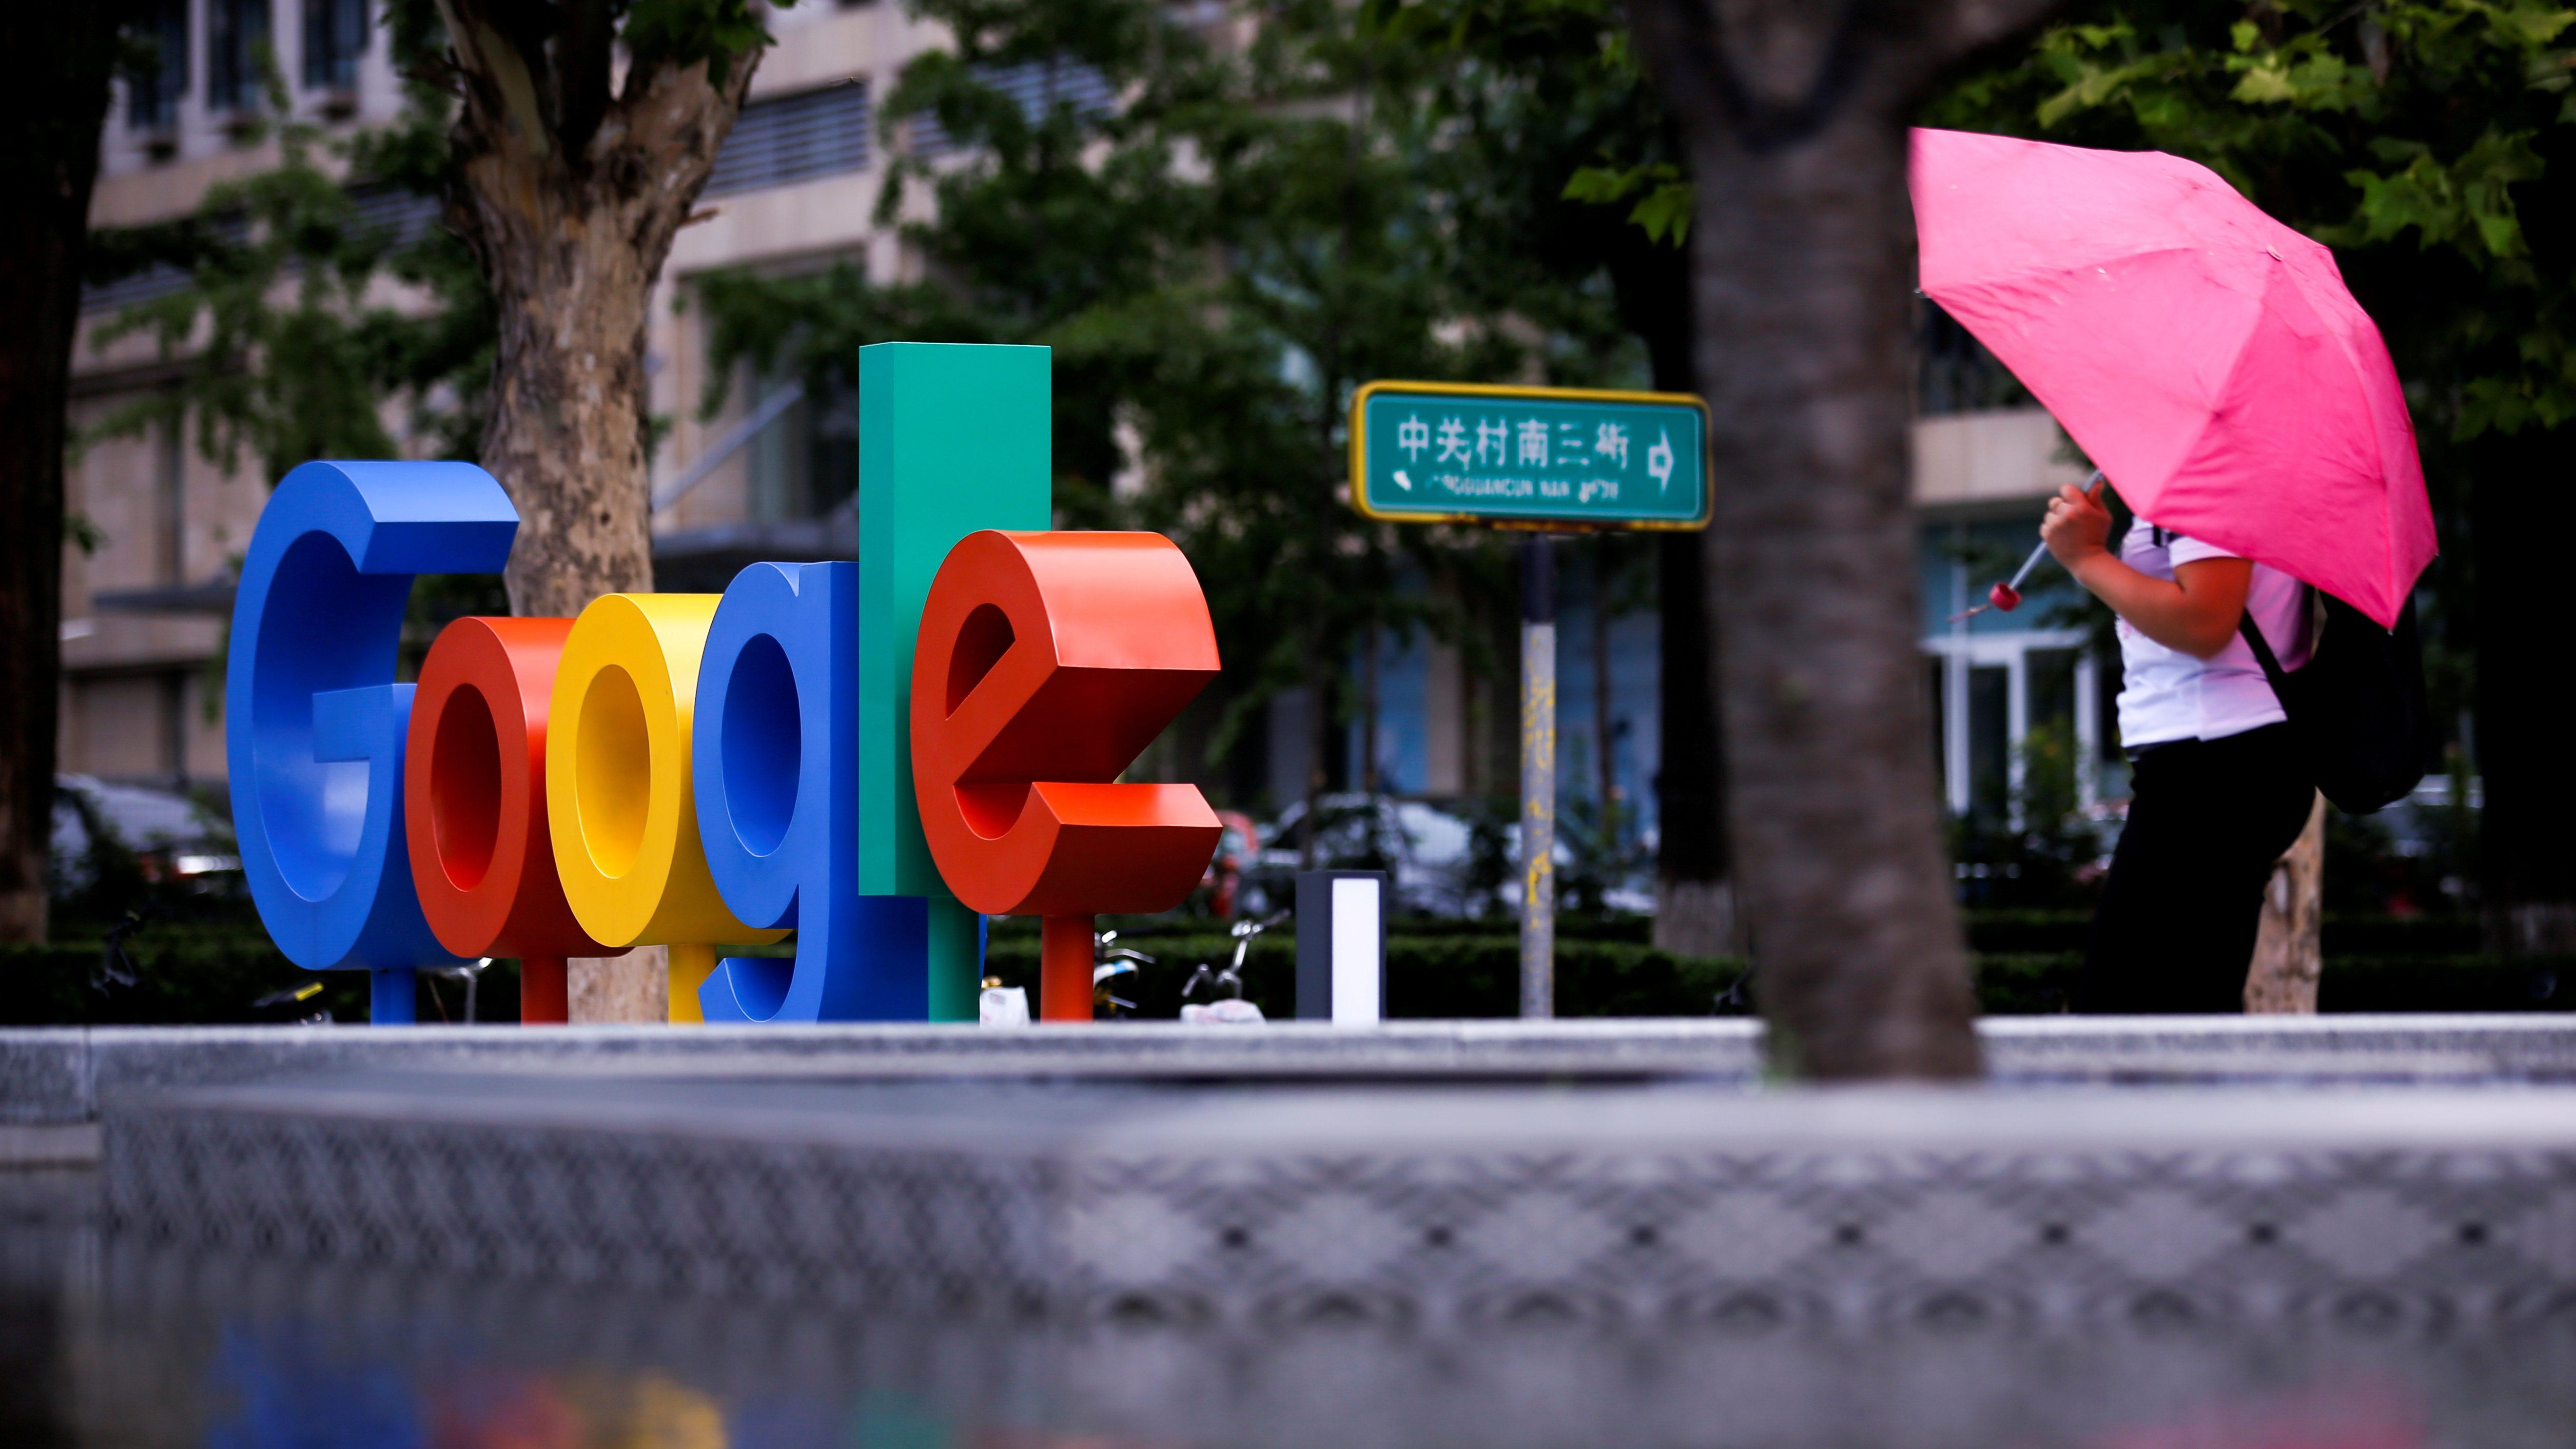 Google's logo is seen on a rainy city street.